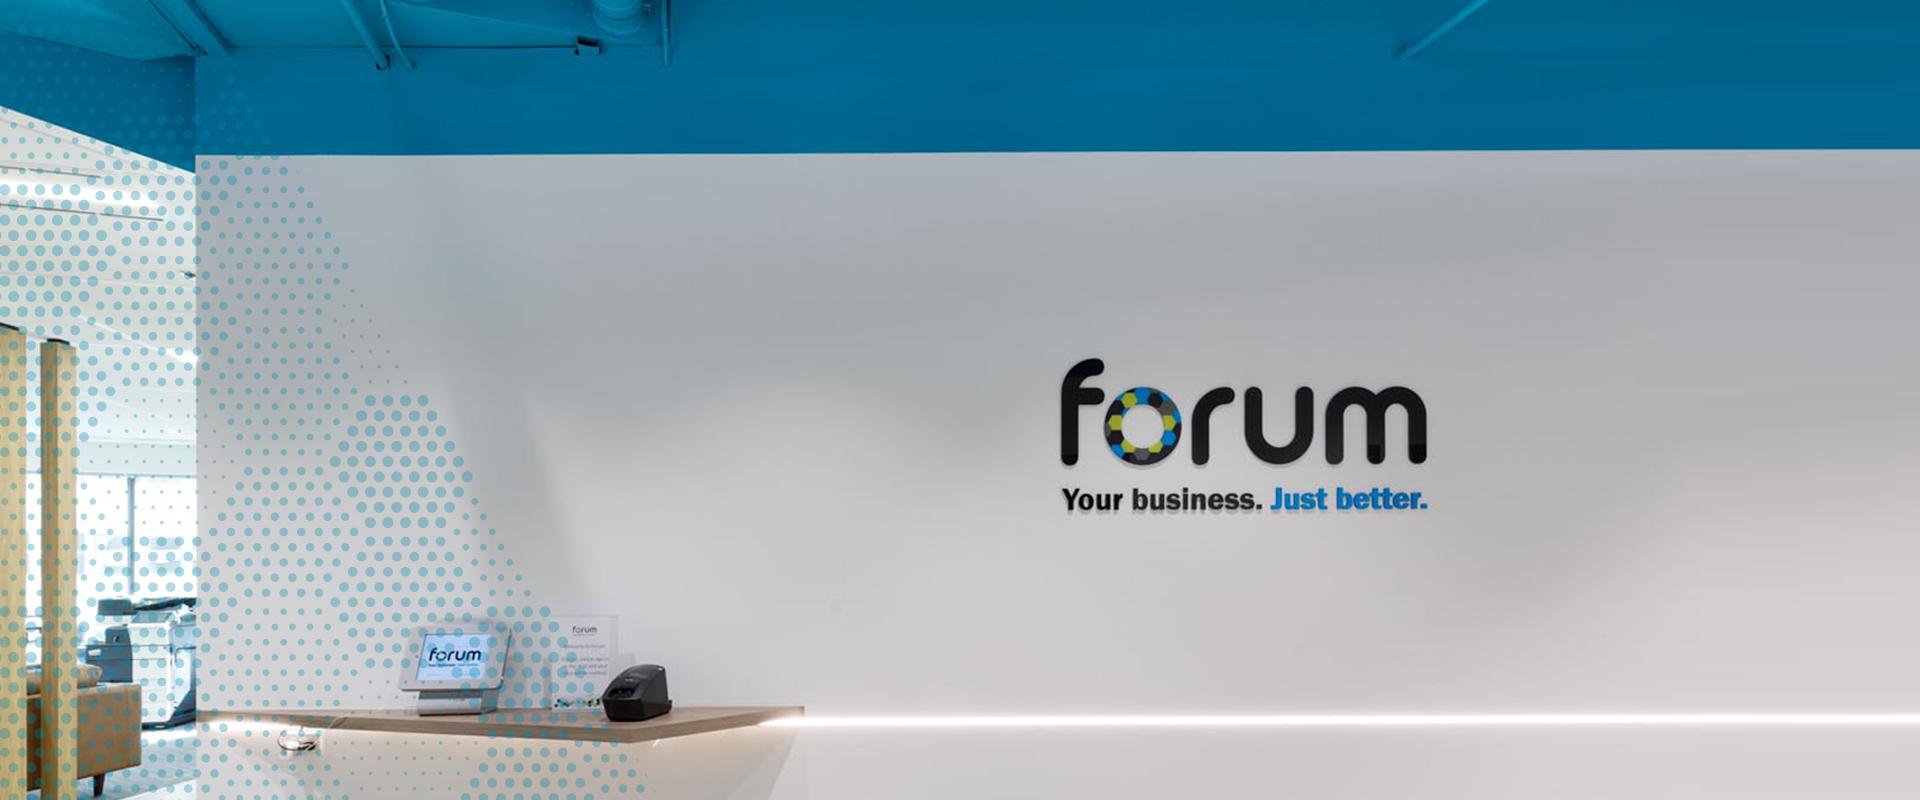 M229518-Forum Group-Website Banners_FullHeader-WAF-v2.jpg